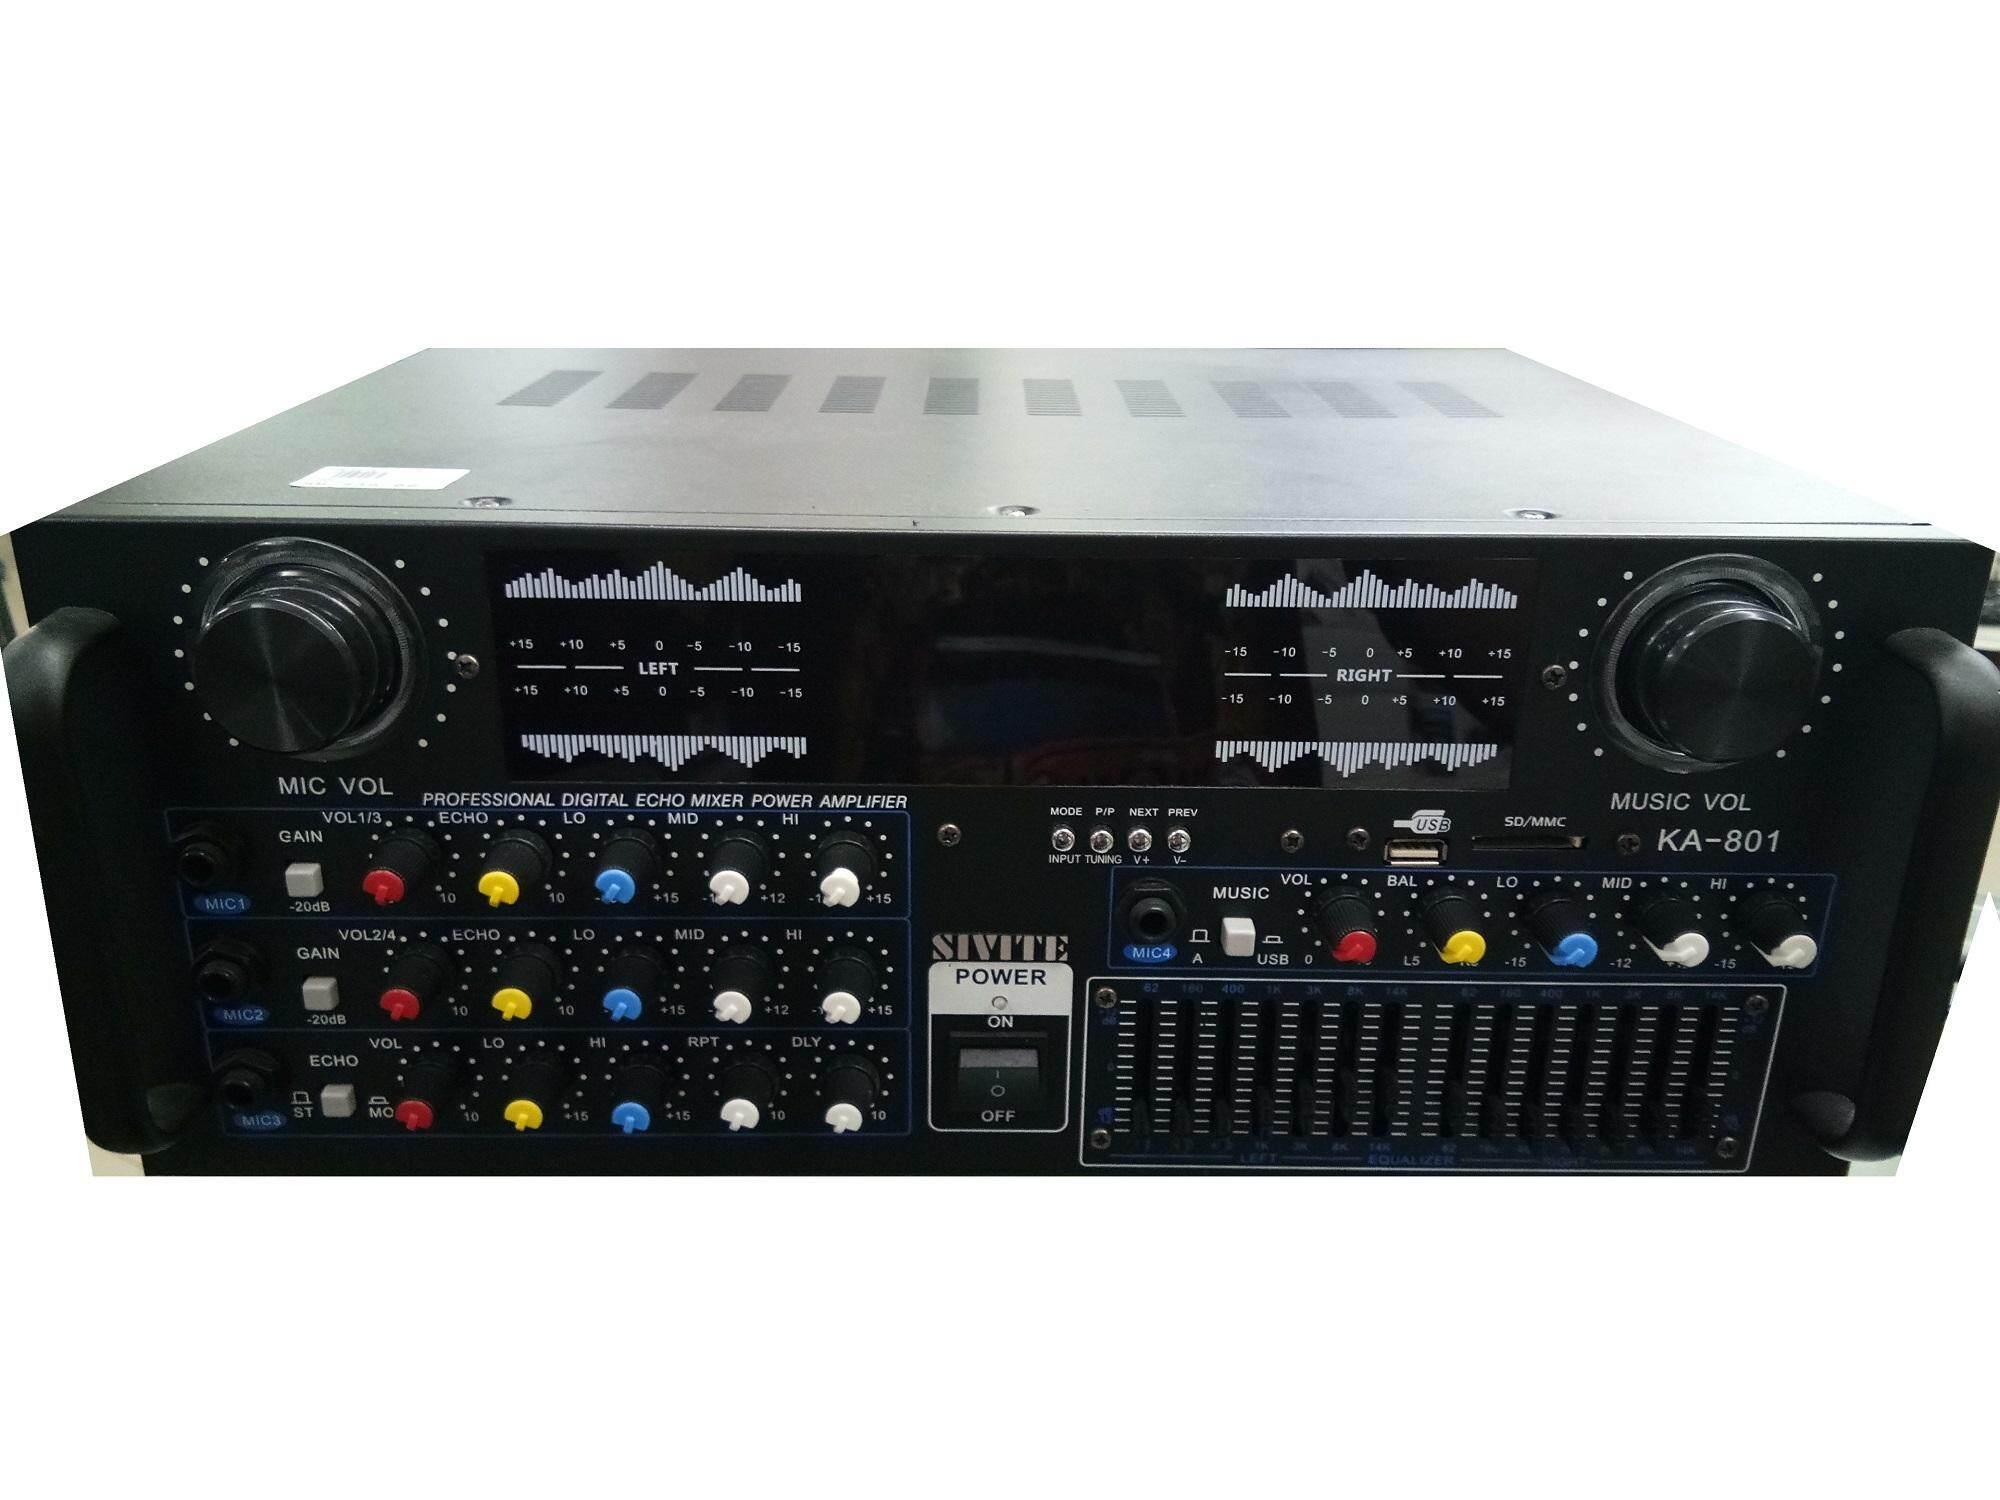 Features 220v Bluetooth 500w Karaoke Power Stero Amplifier With Vu Meter For Amplifiers Ka801 Professional Stereo Digital Echo Mixer Usb Sd Fm